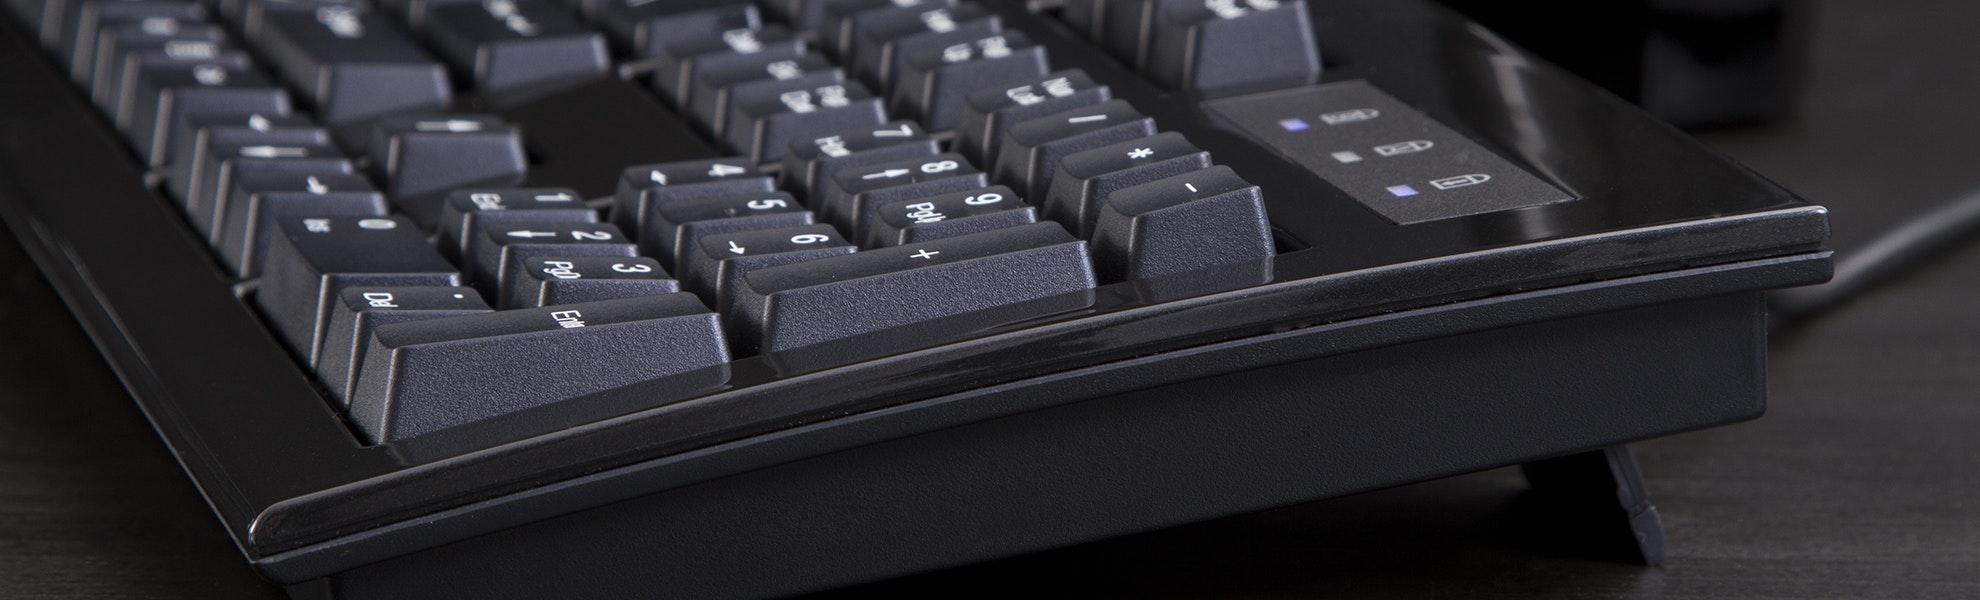 Monoprice Cherry MX Blue Keyboard